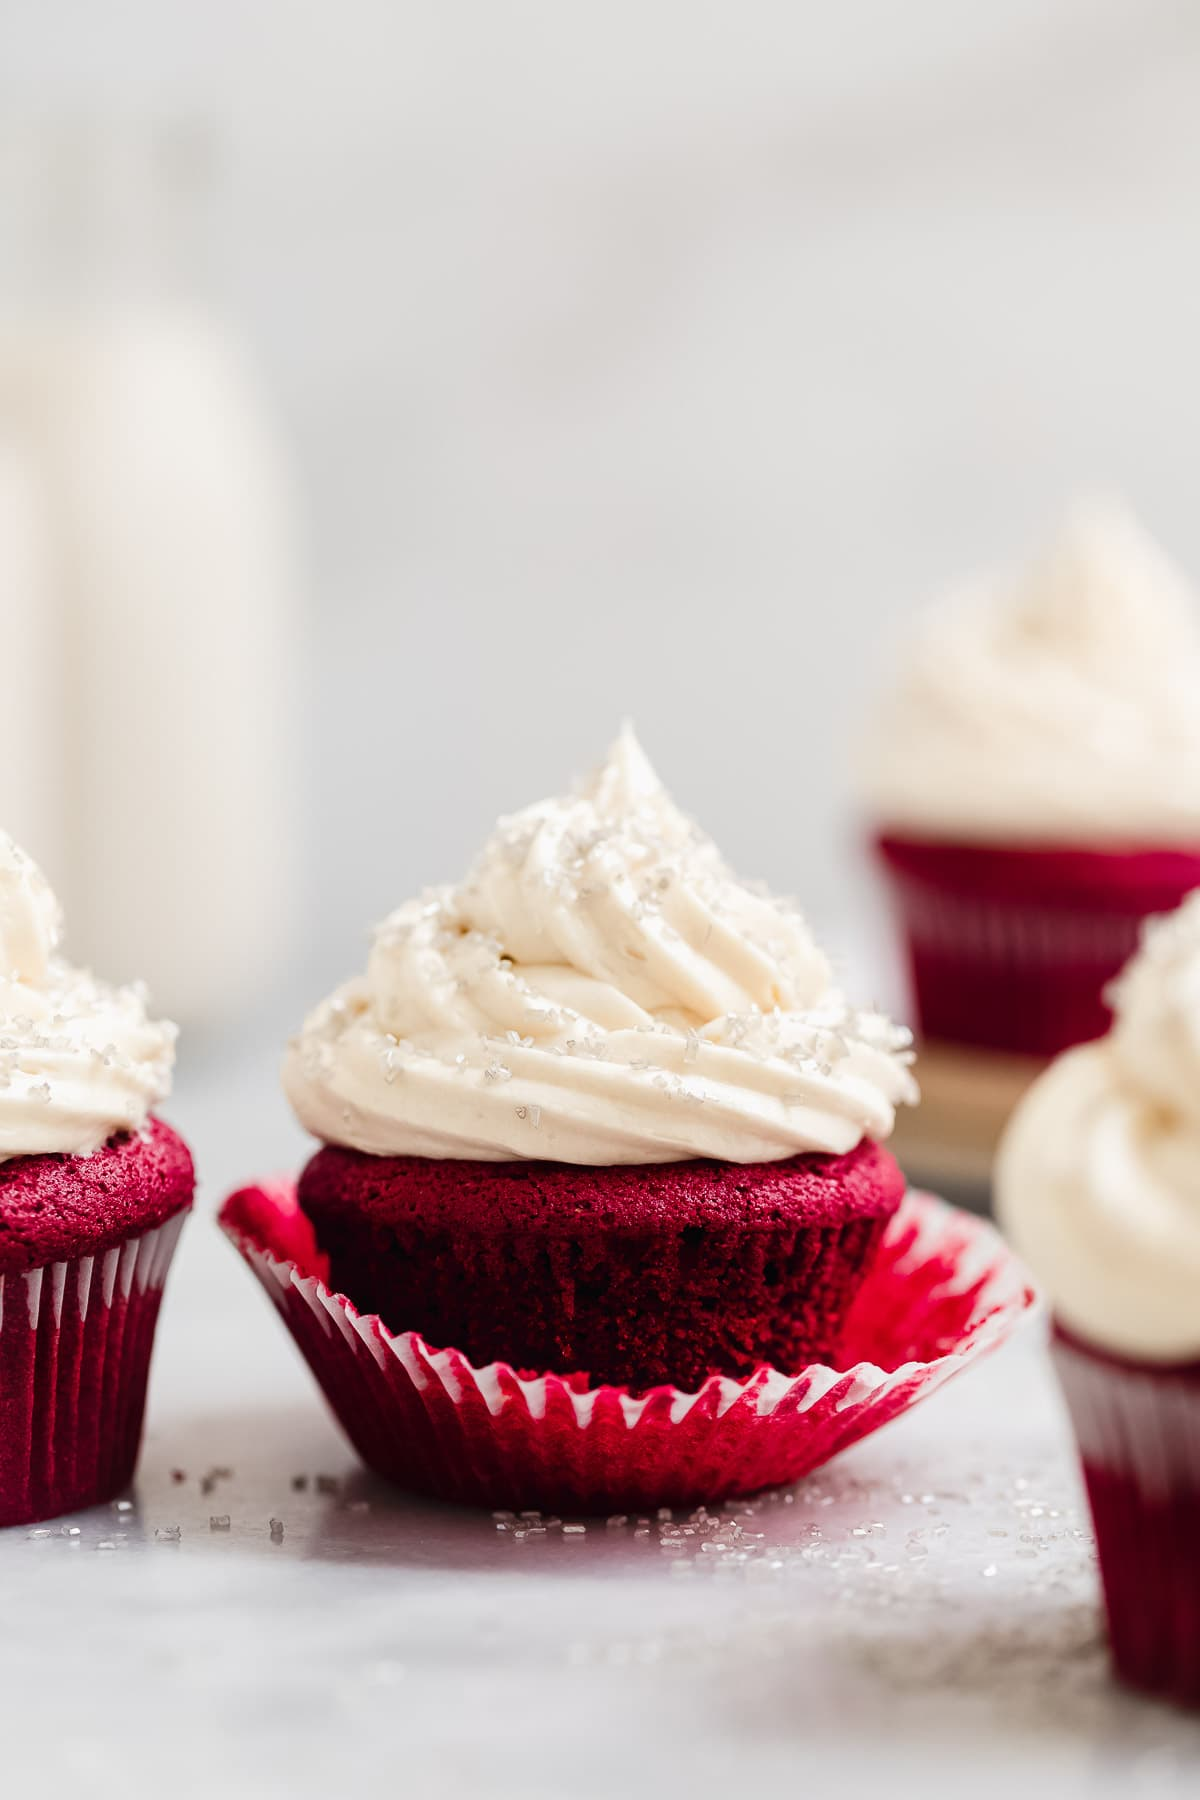 vegan red velvet cupcakes with milk in the background